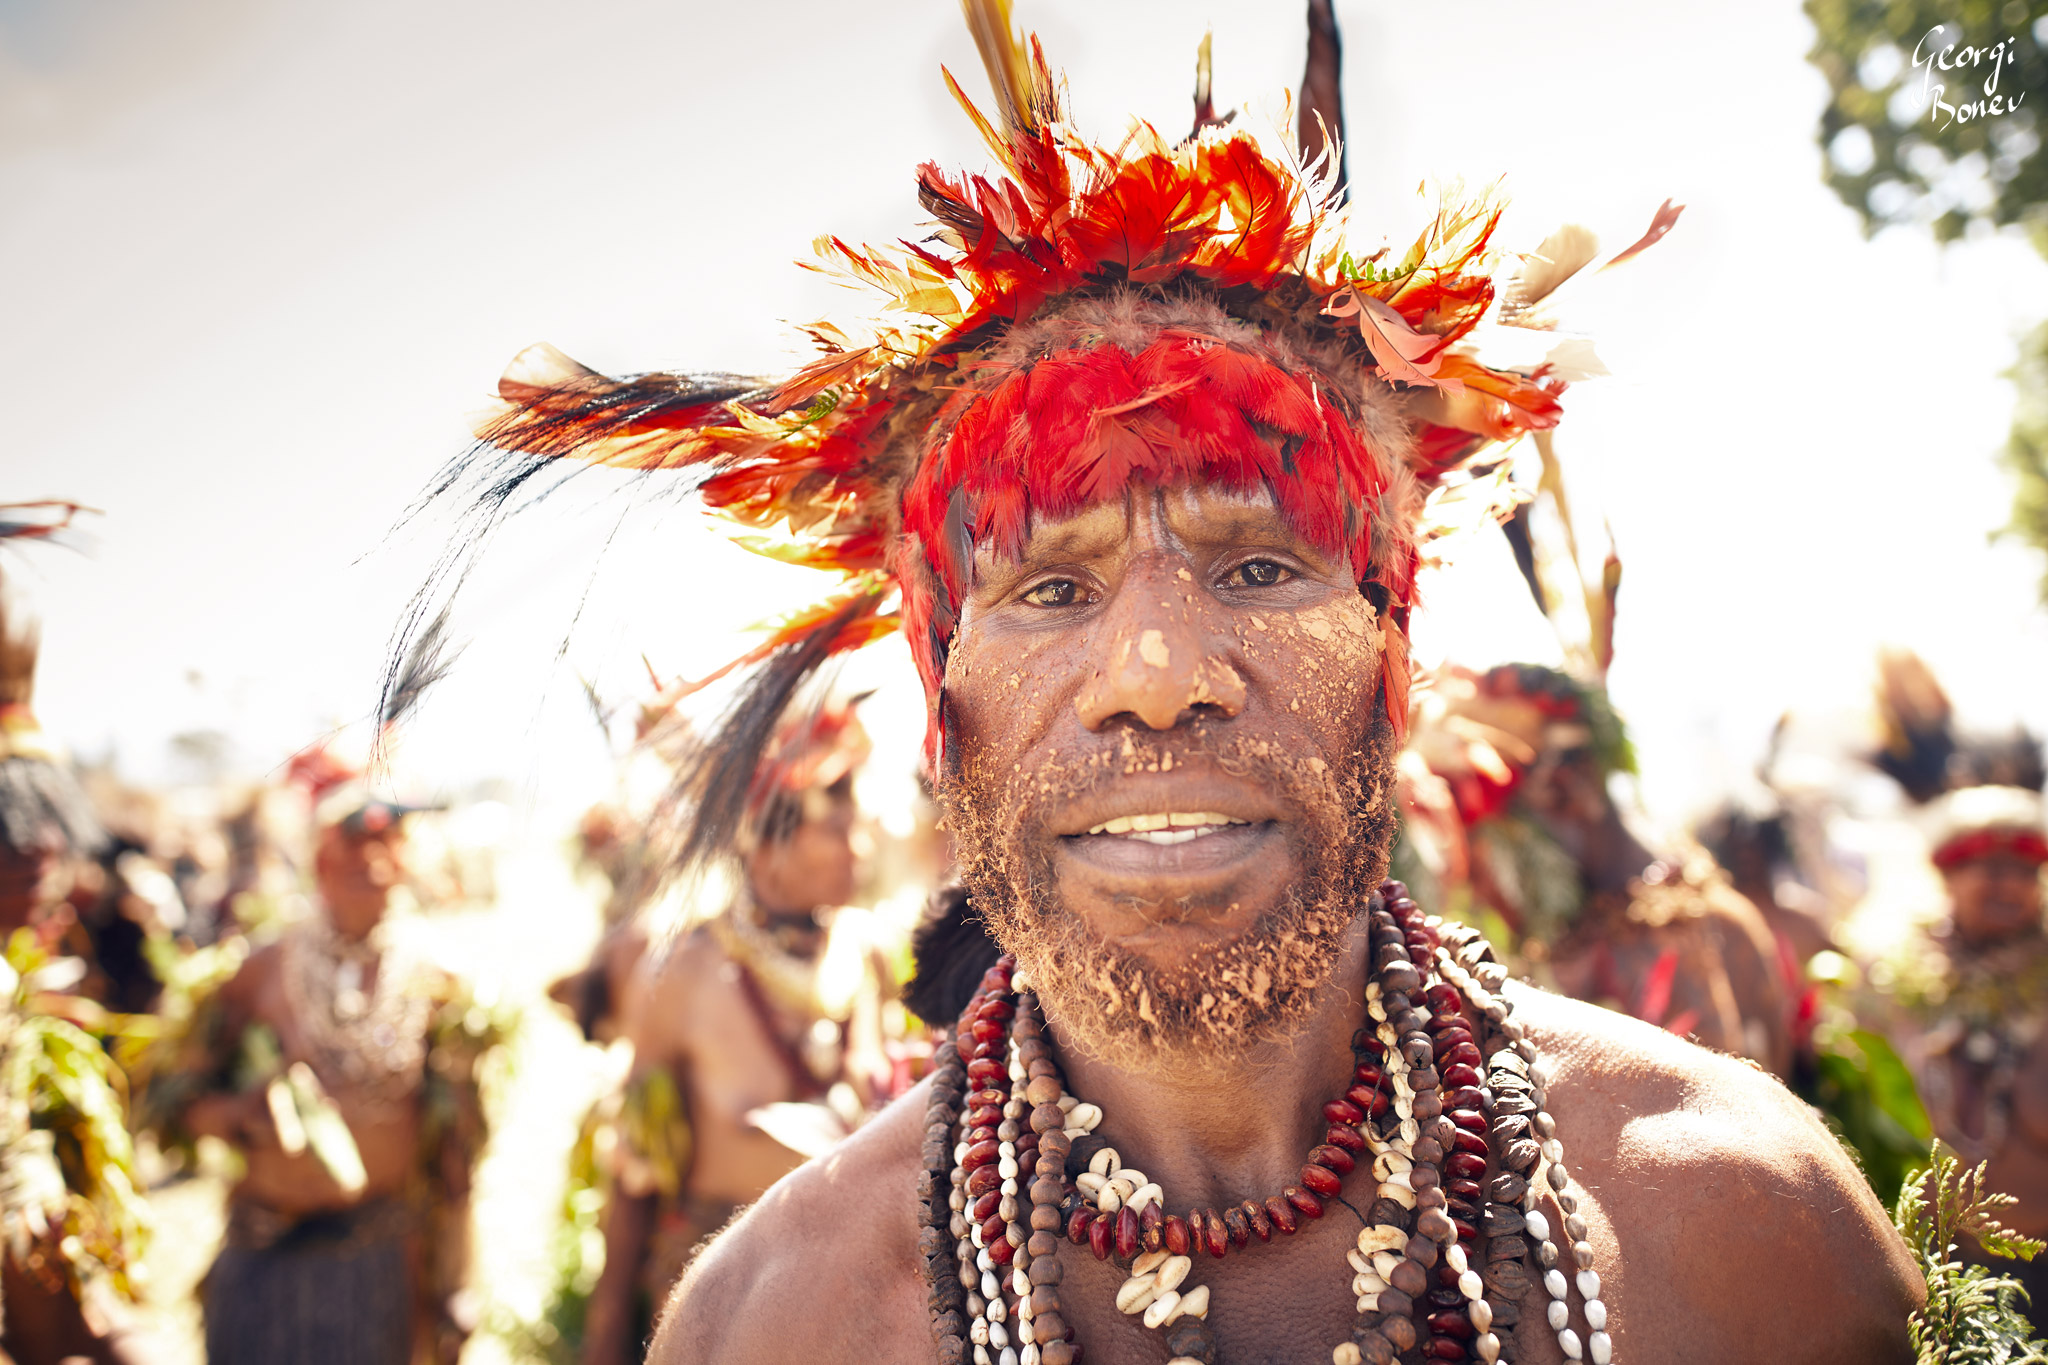 WIRI IS ATRIGU WARRIOR IN PAPUA NEW GUINEA